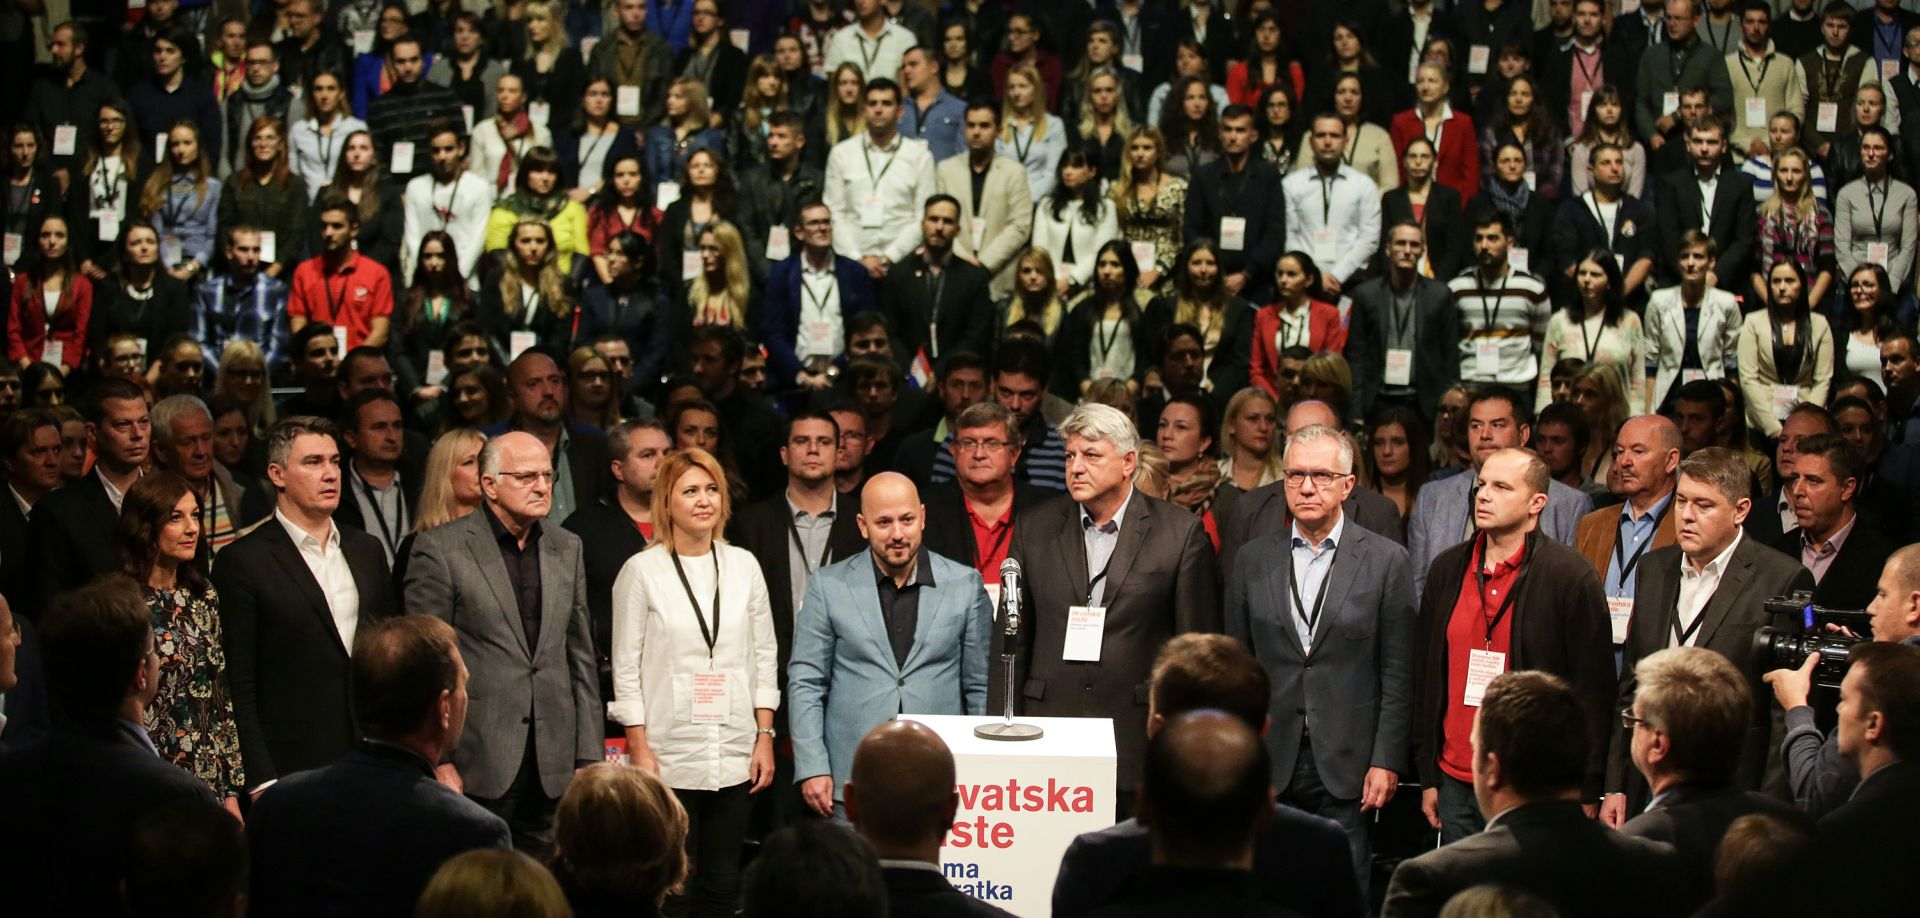 IZBORI 2015. Koalicija Hrvatska raste objavila izborne liste